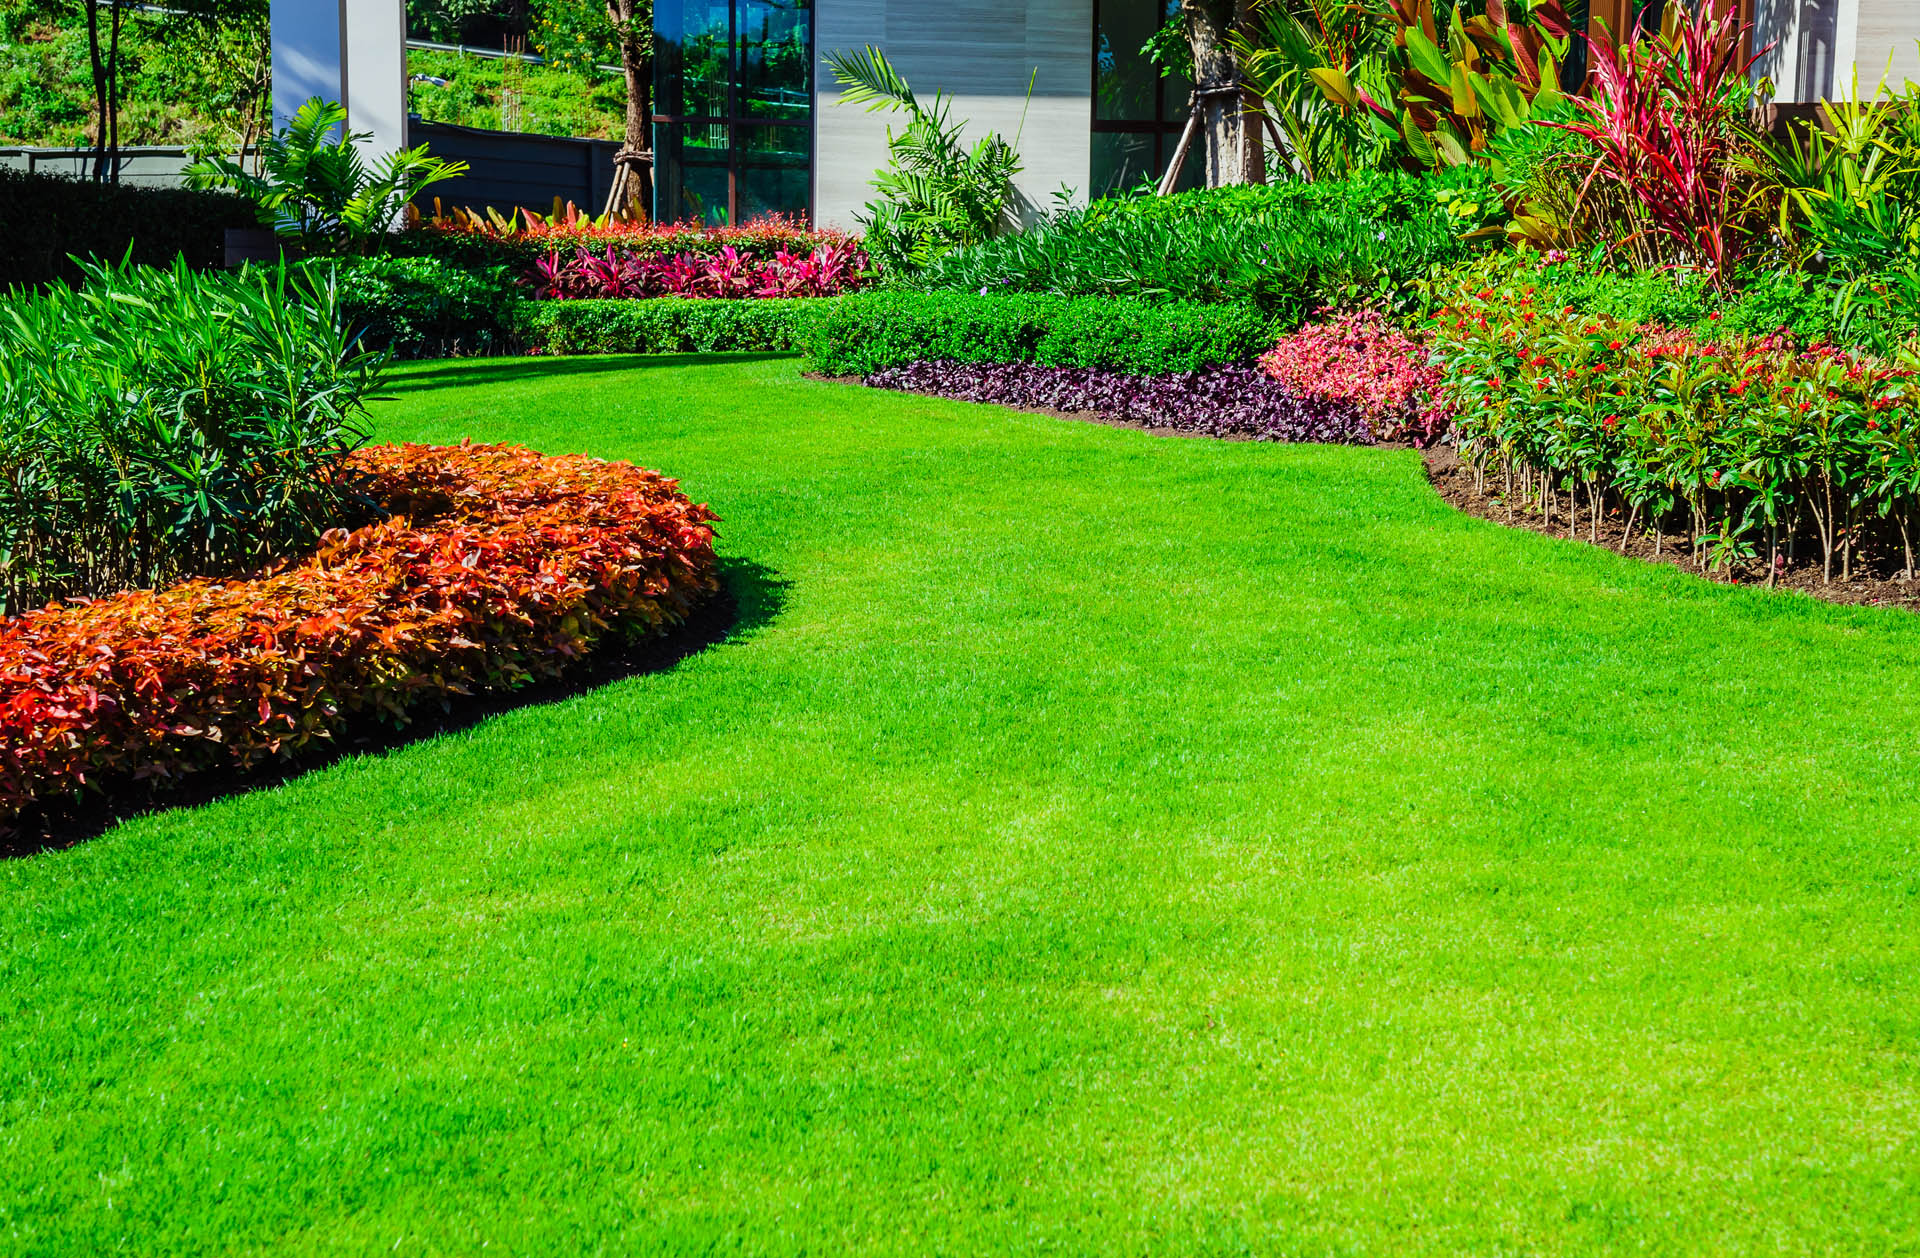 lawn-care 1.jpg